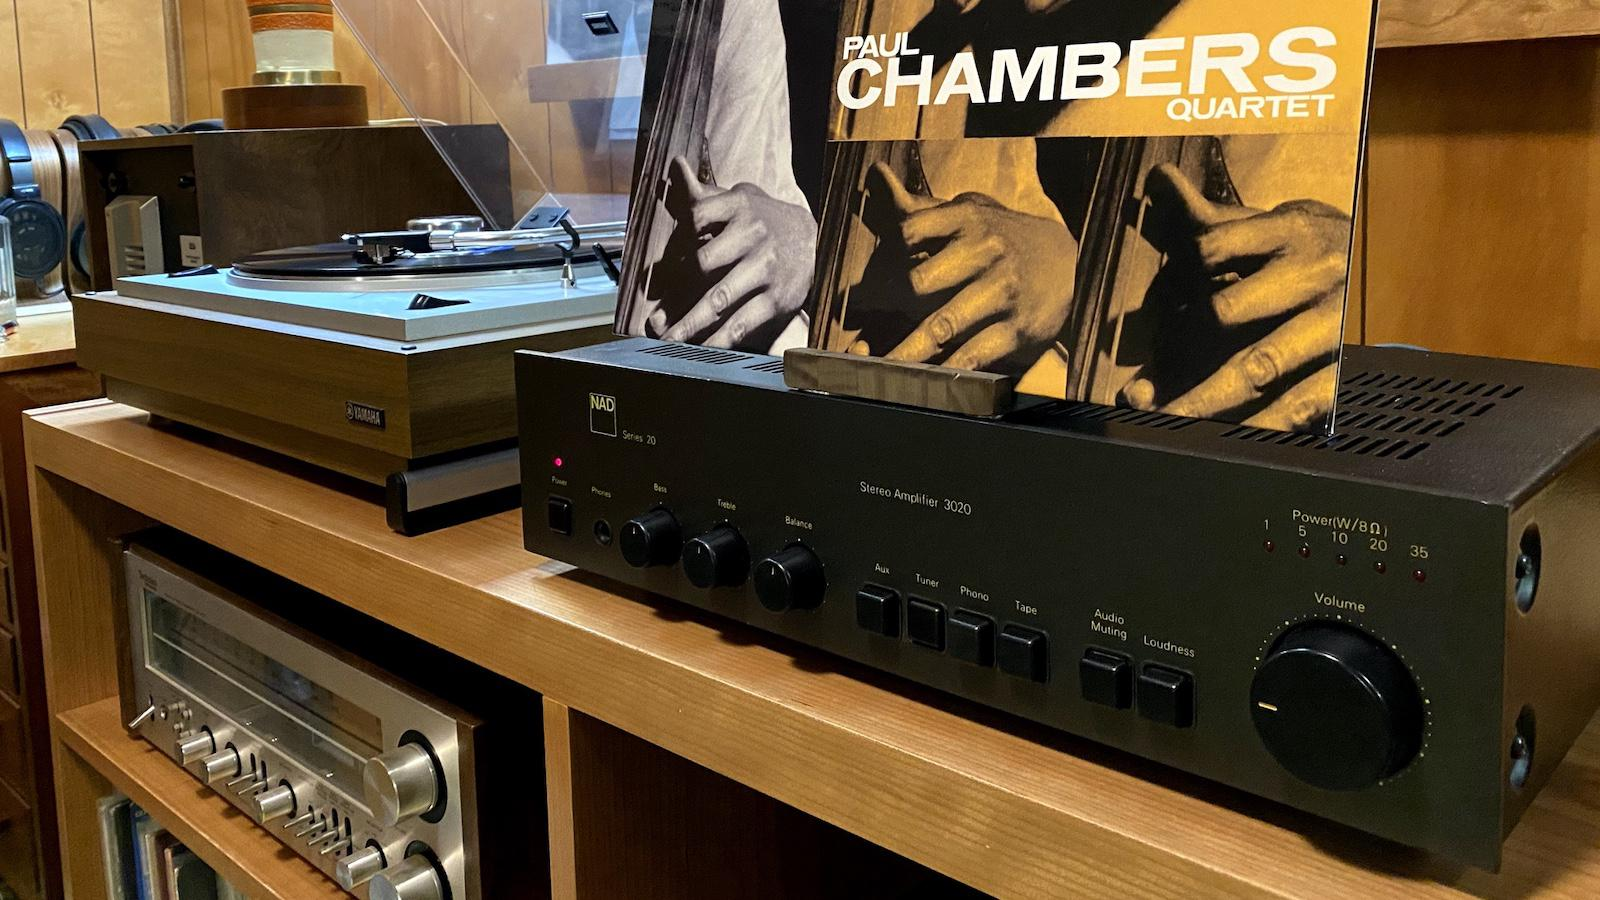 Eric Pye Hi-Fi Stereo System playing Paul Chambers Quartet